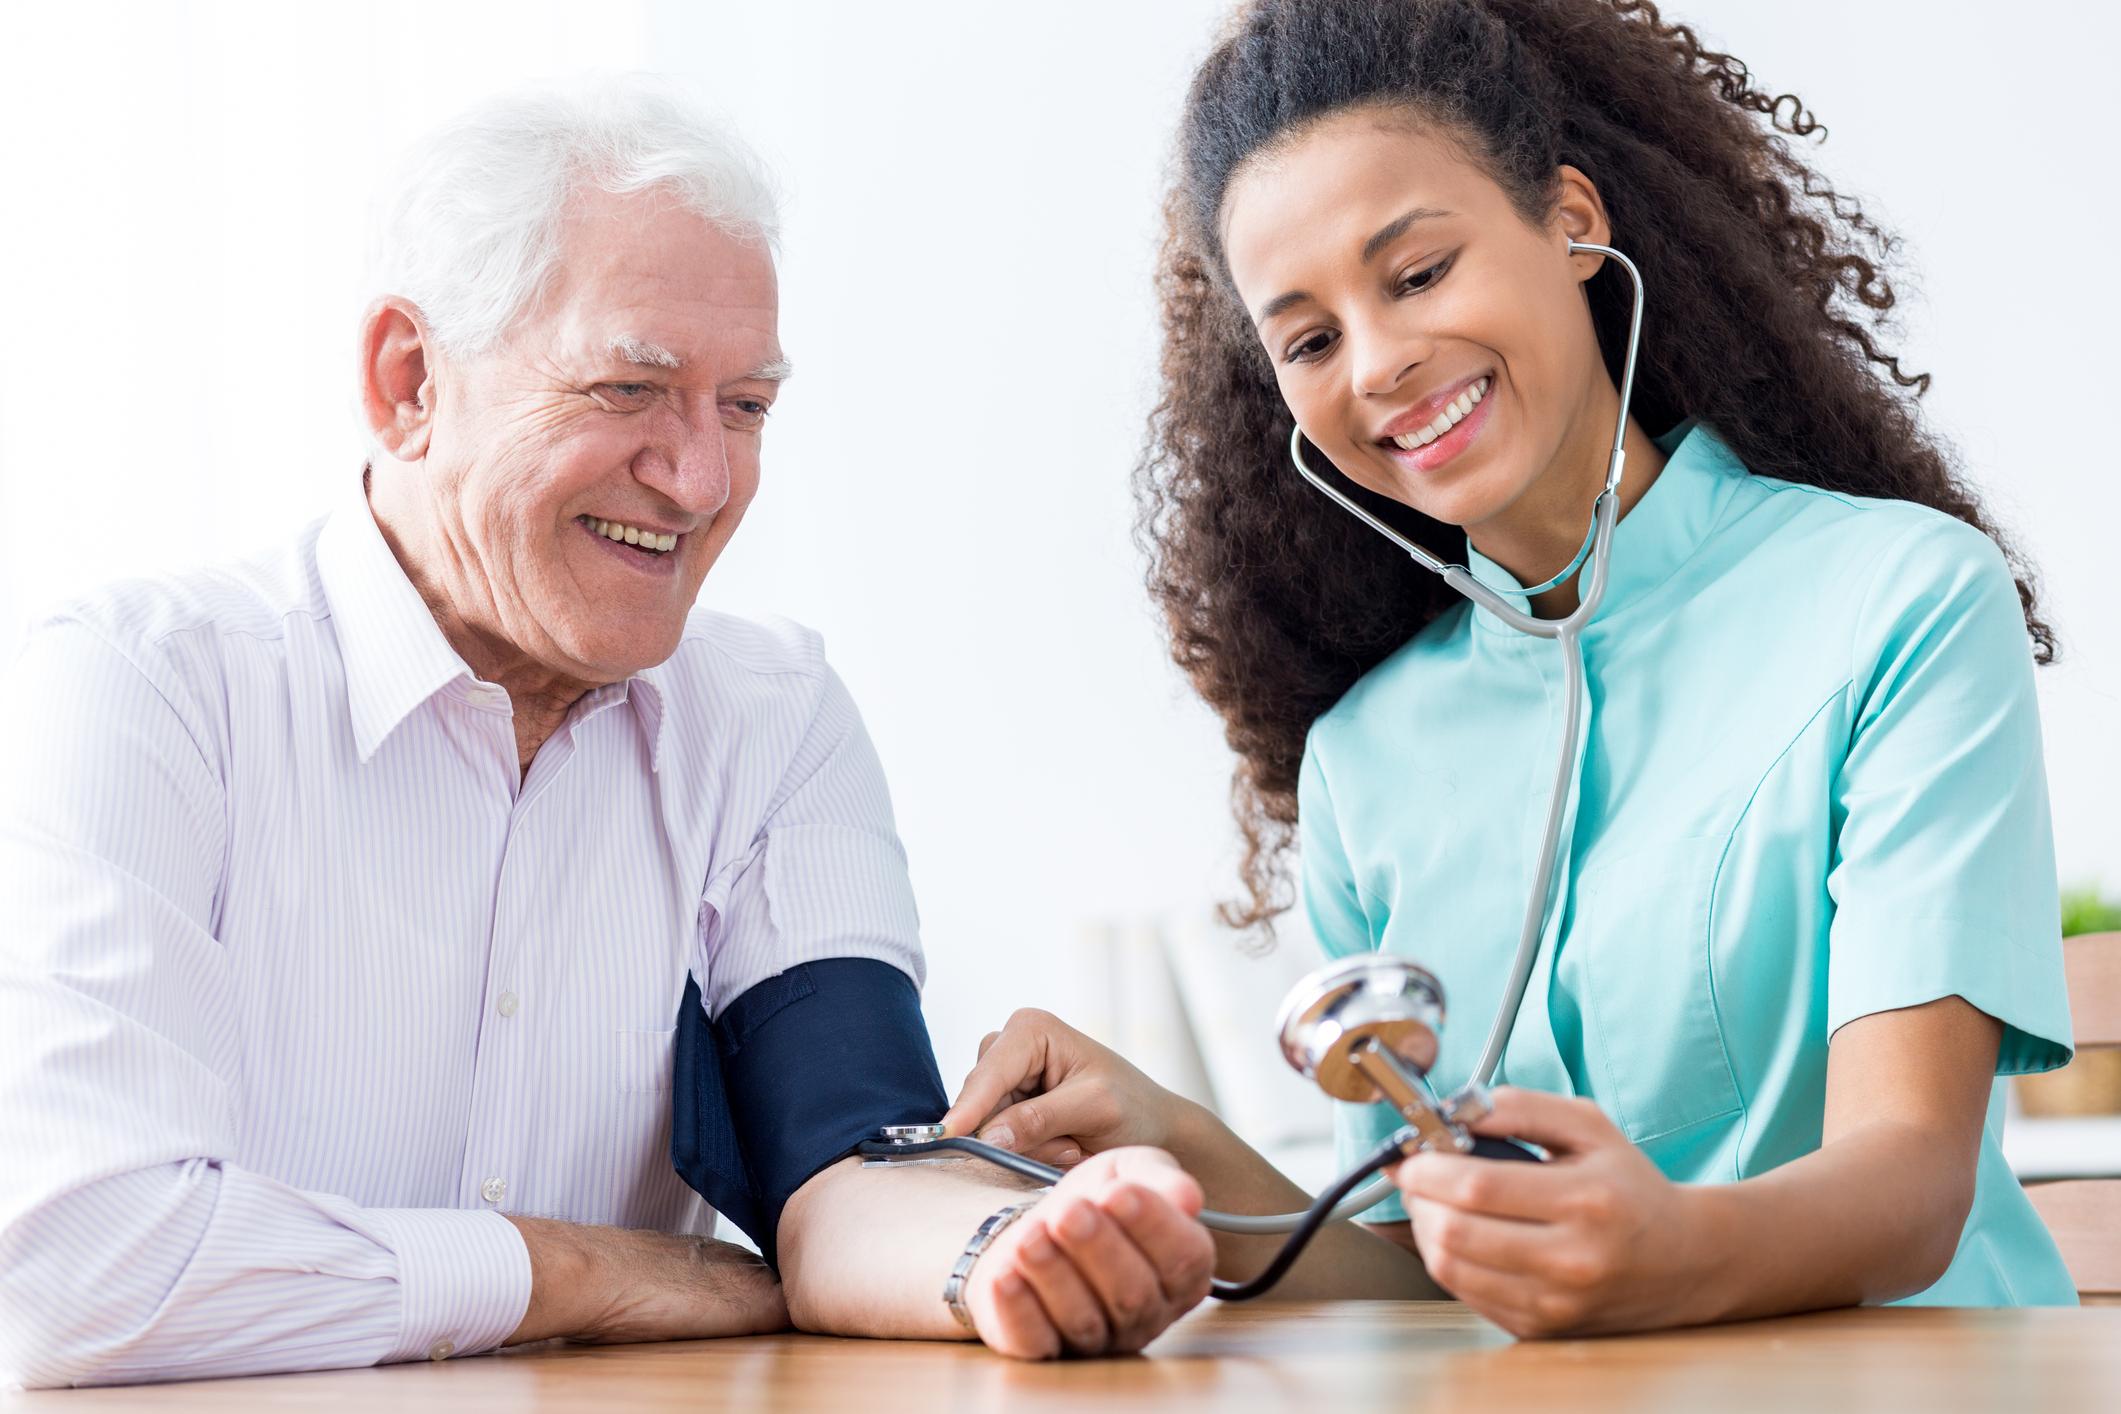 Senior man having blood pressure taken by young woman in scrubs.